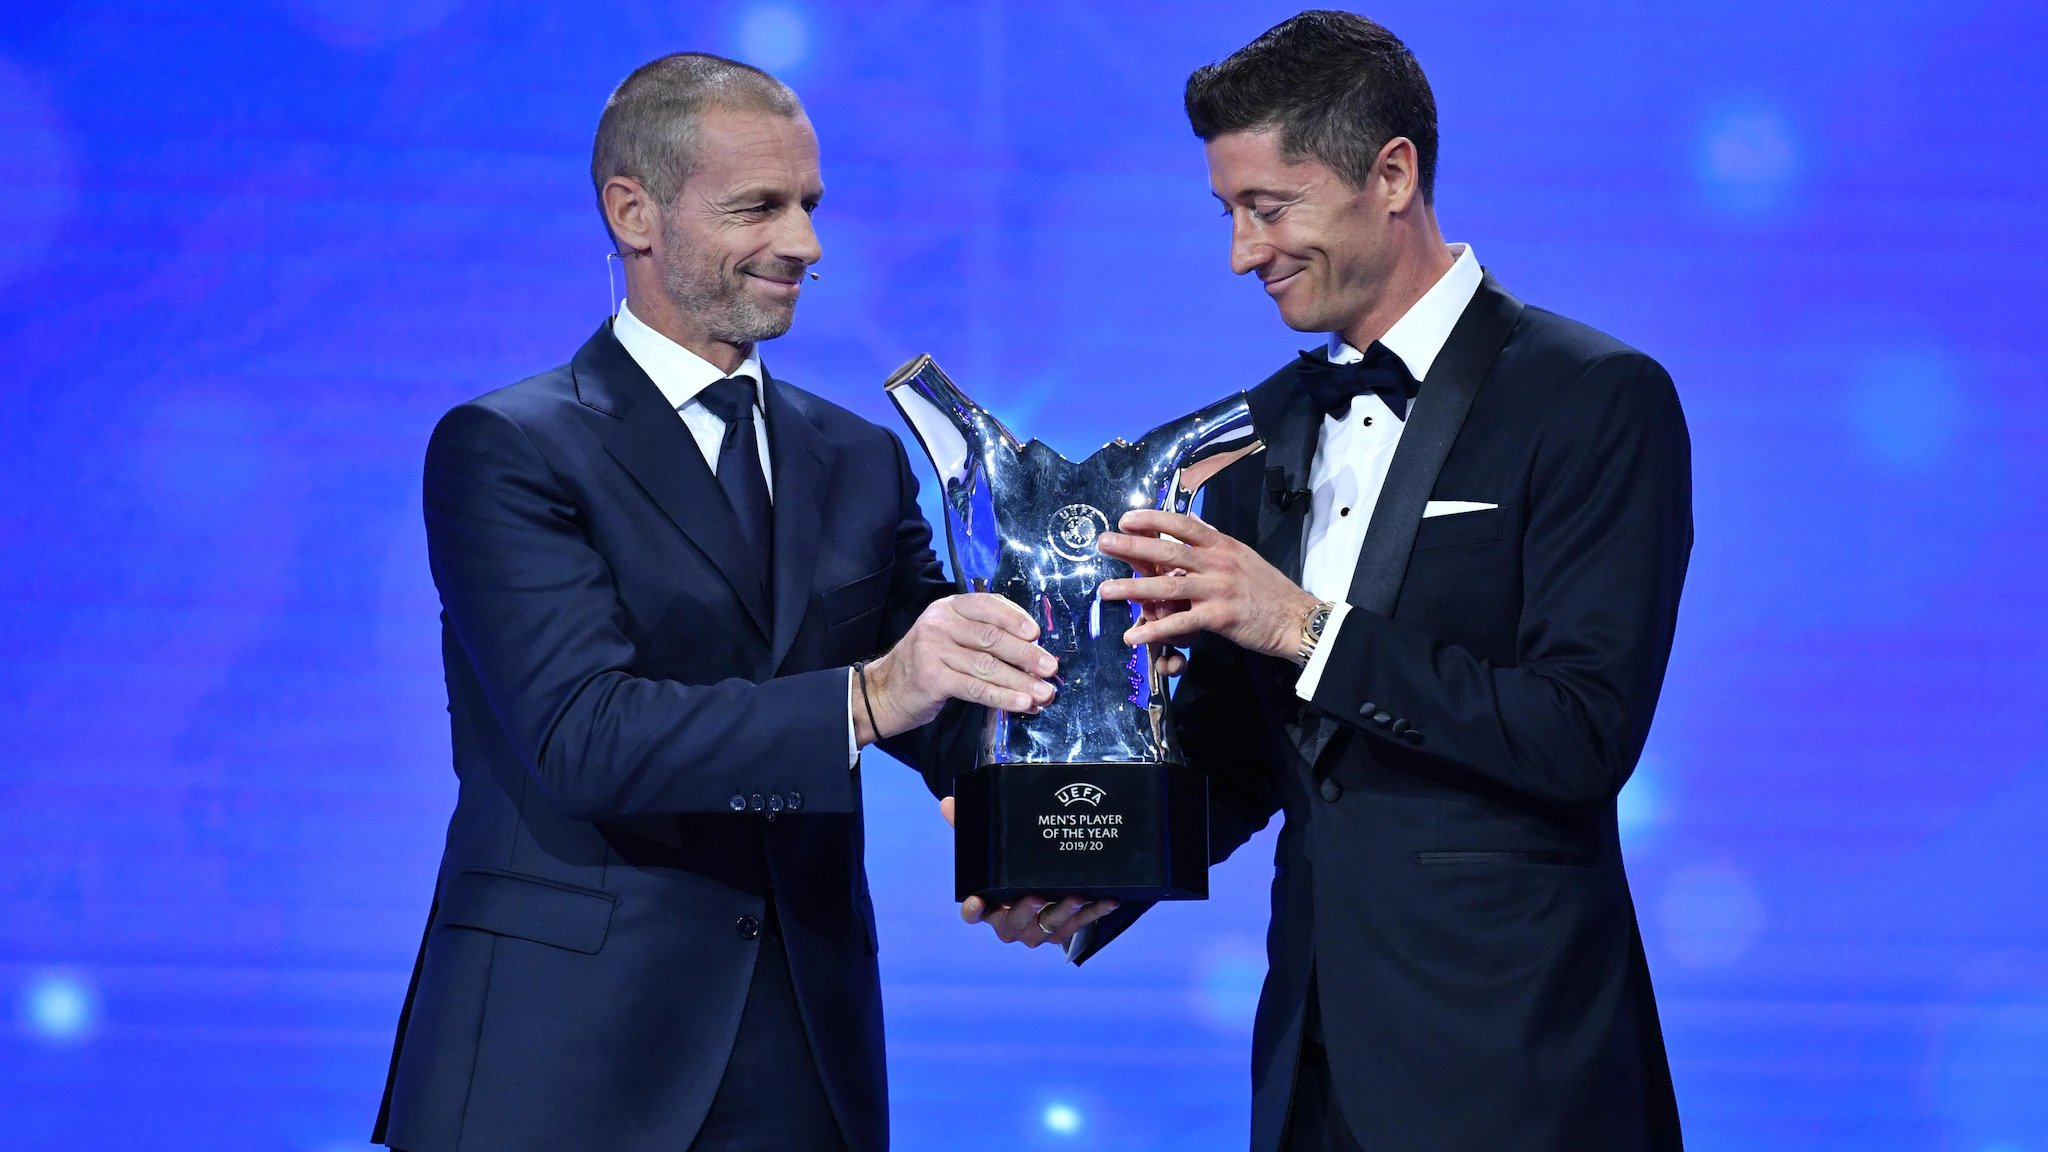 Robert Lewandowski receives his award in 2020